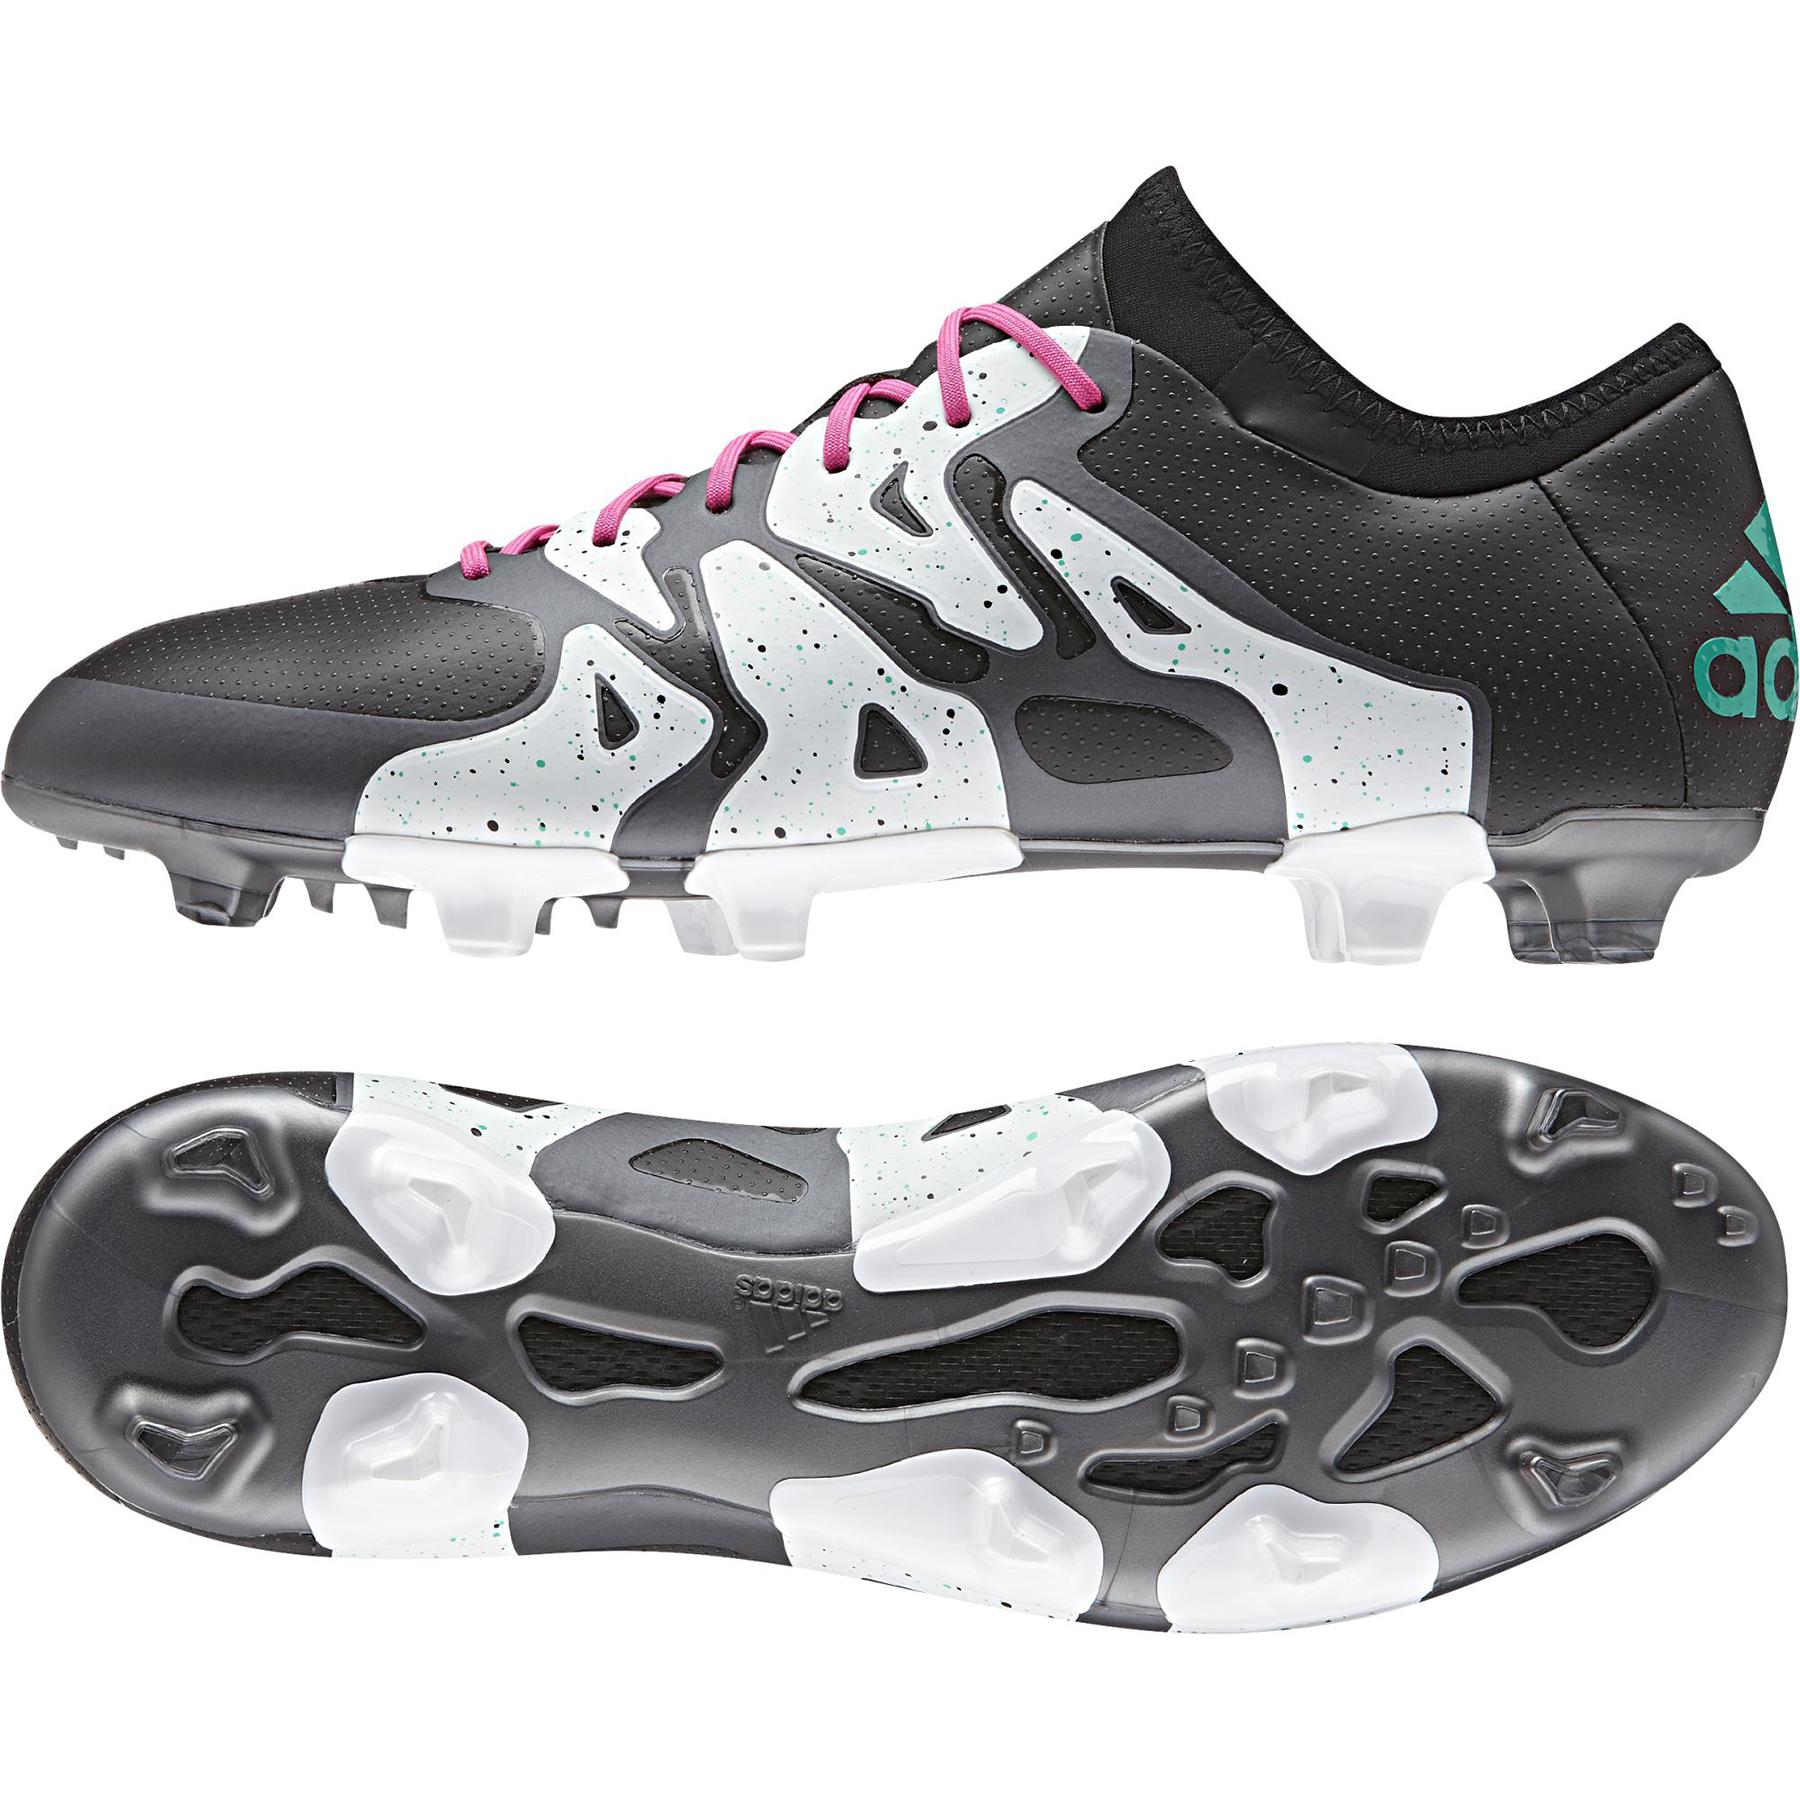 adidas X 15.1 Firm Ground Football Boots Black